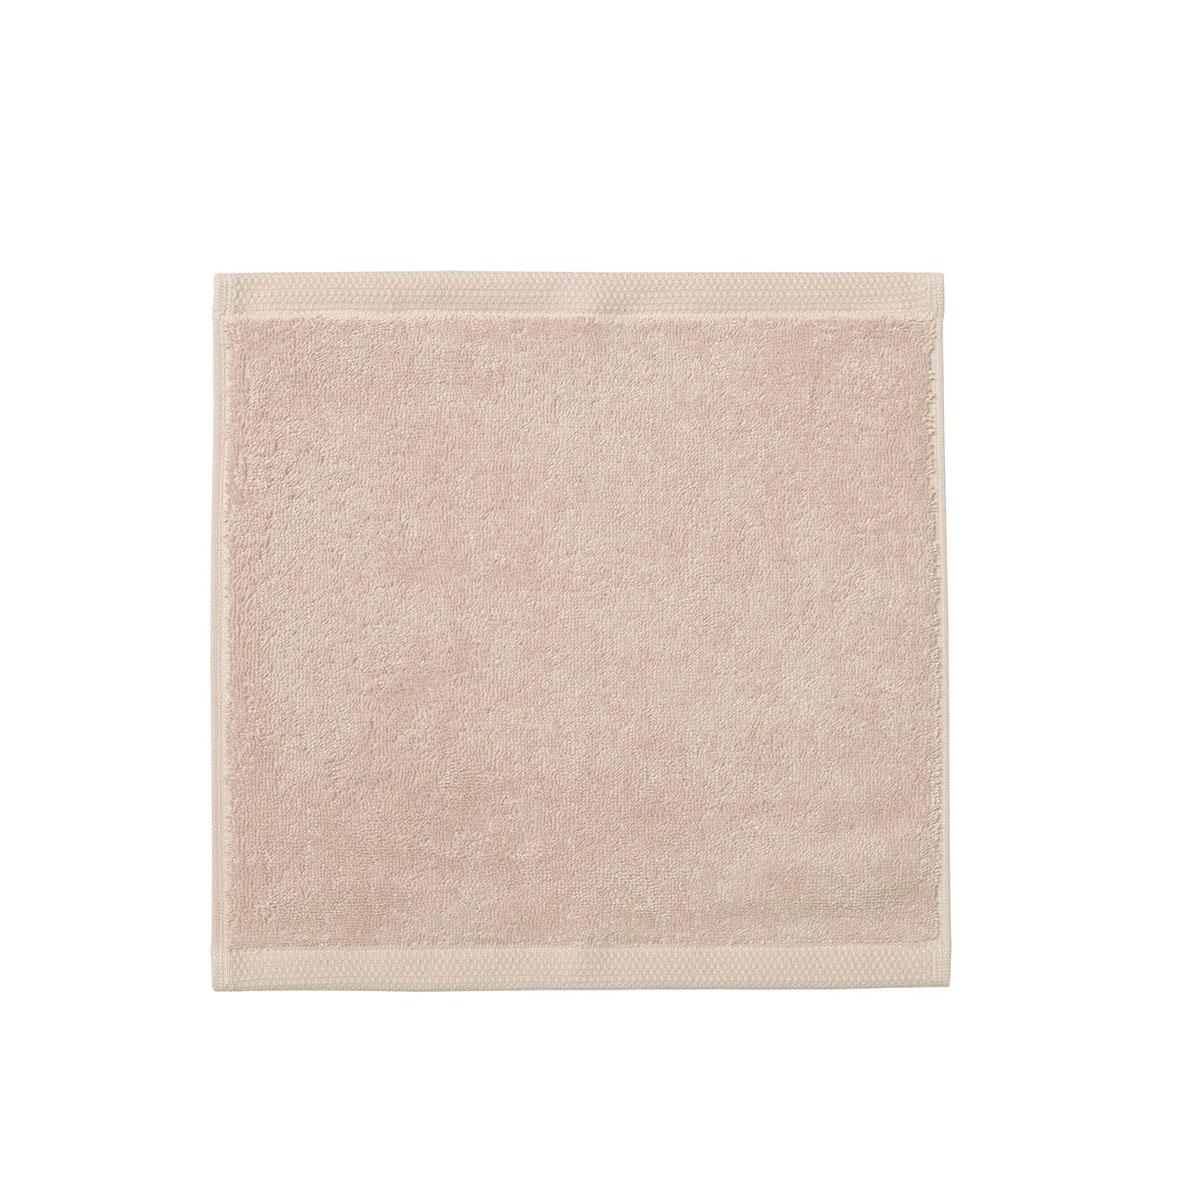 Carré visage en rose nude 30x30